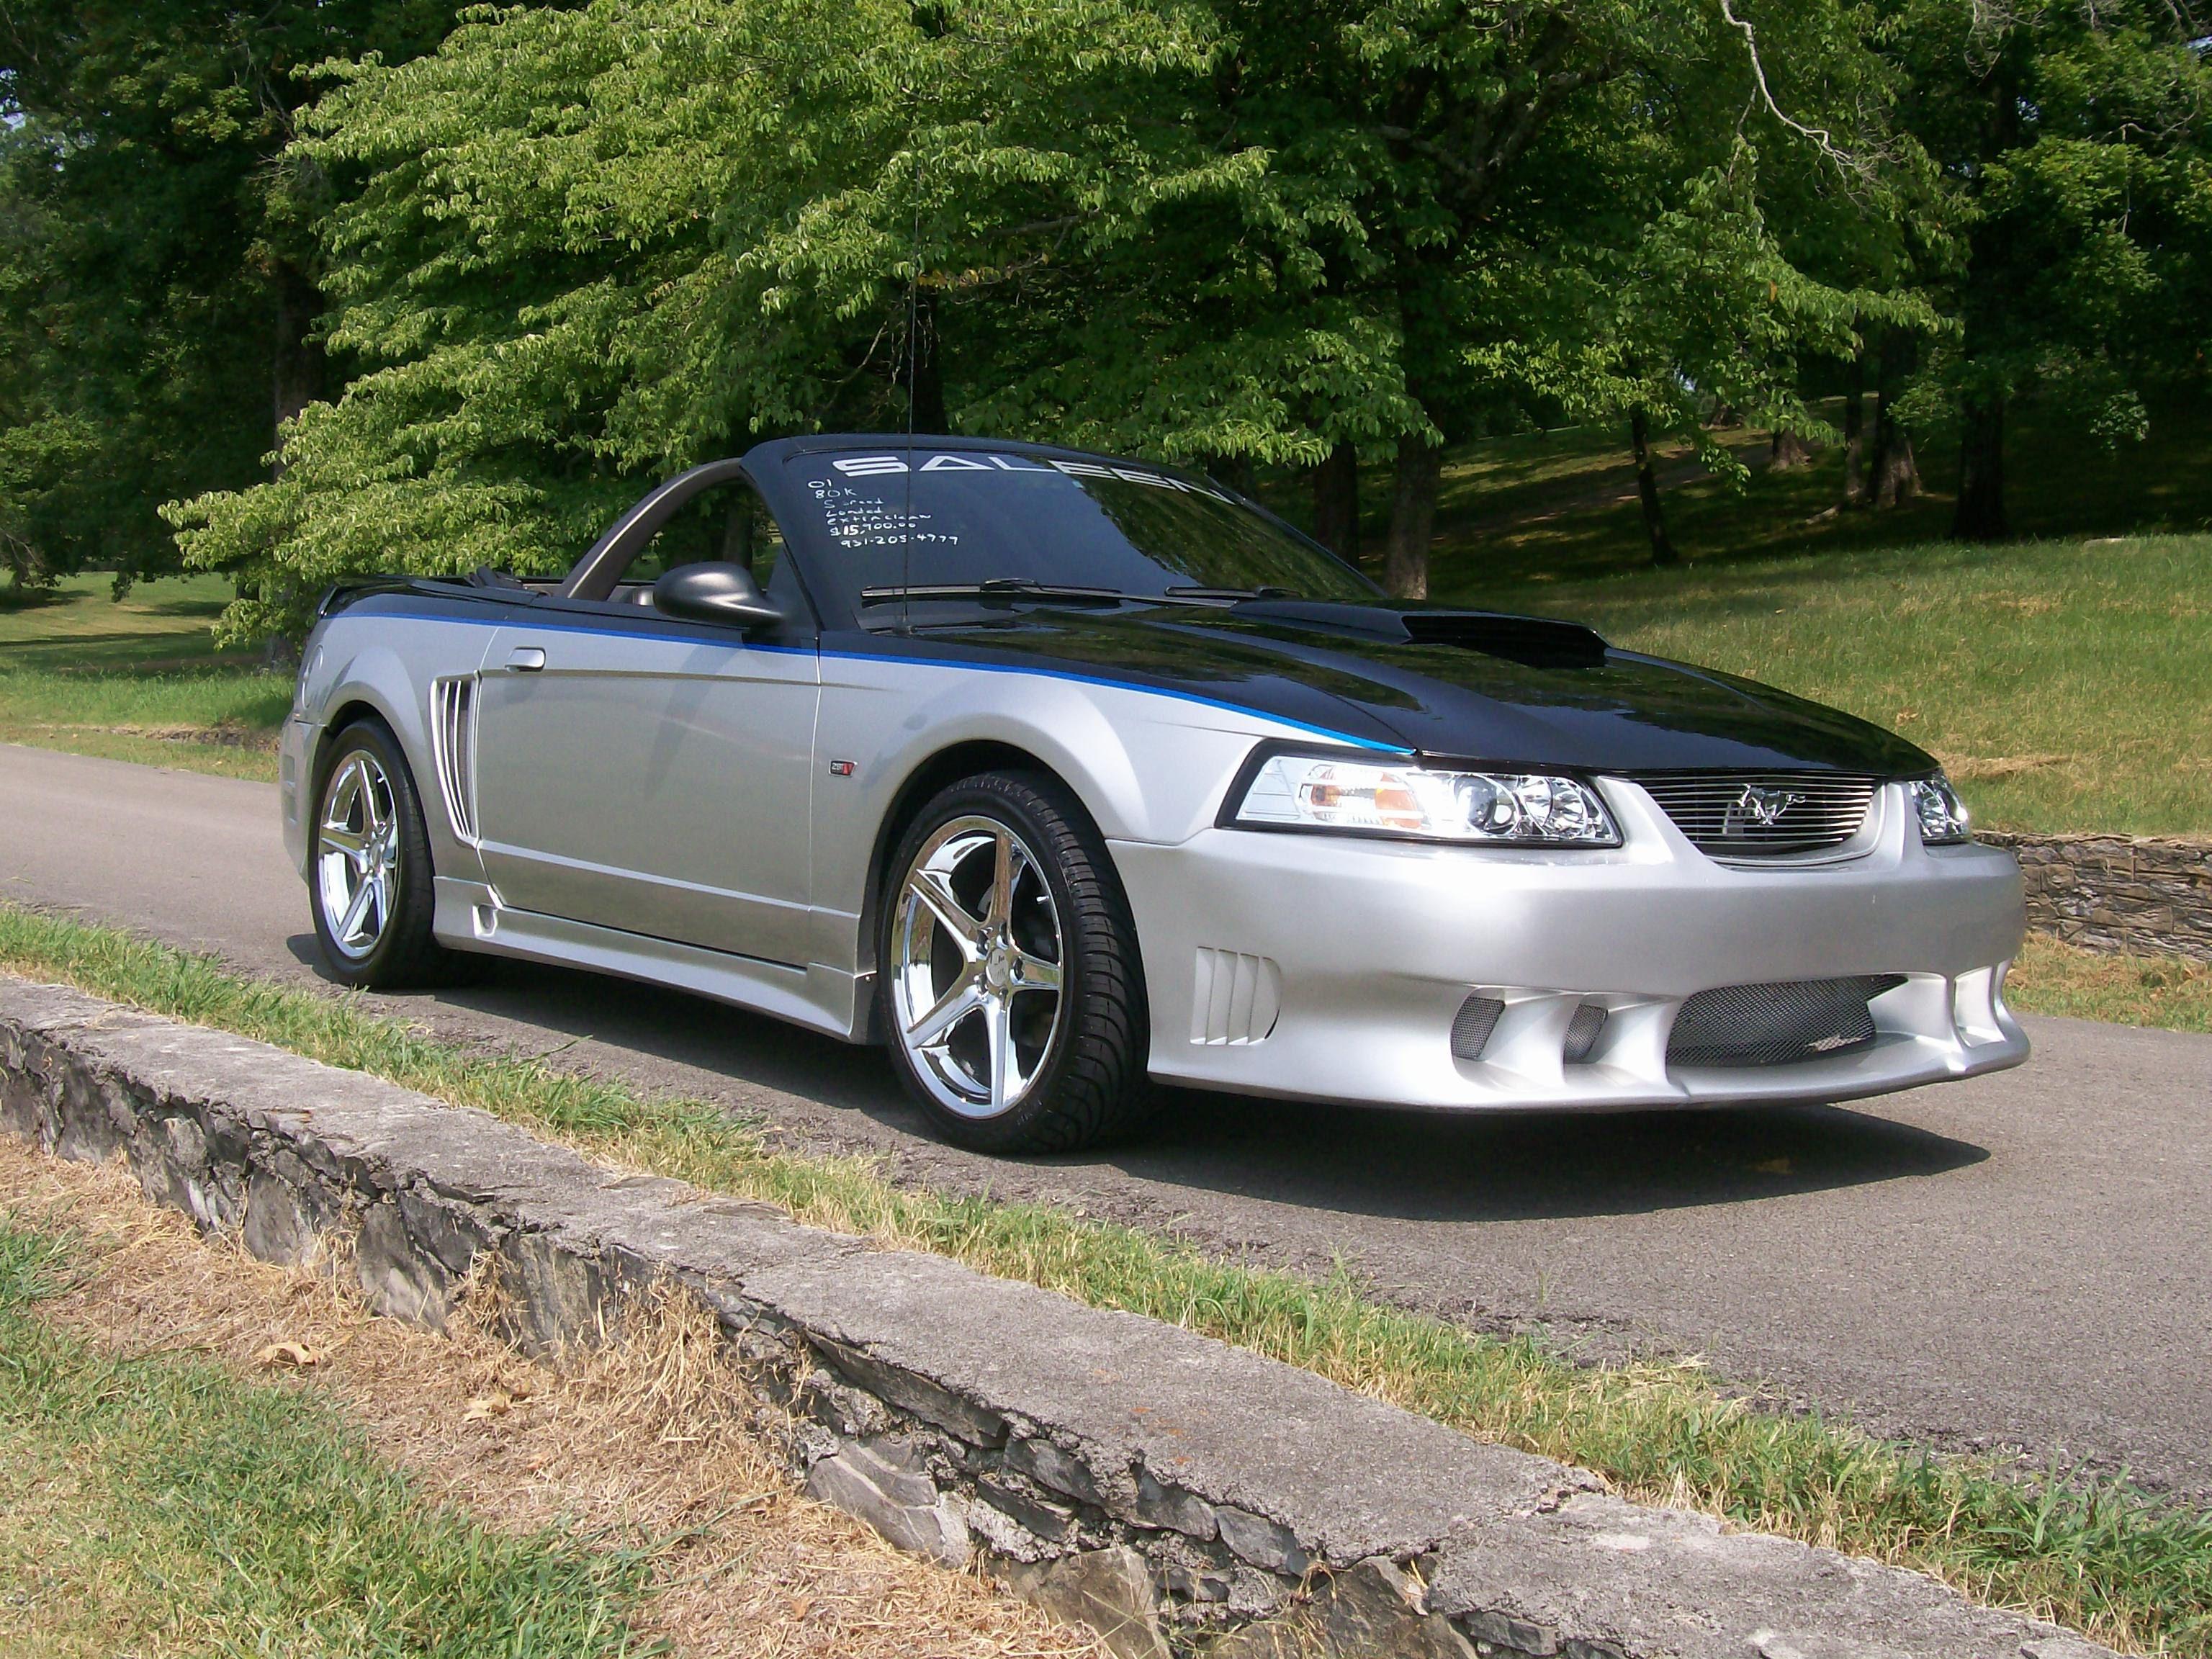 99 04 Saleen Mustang Auto Wheels Tires Tint Accessories 99 04 Mustang Saleen Body Kit Saleen Mustang Mustang Car Wheels